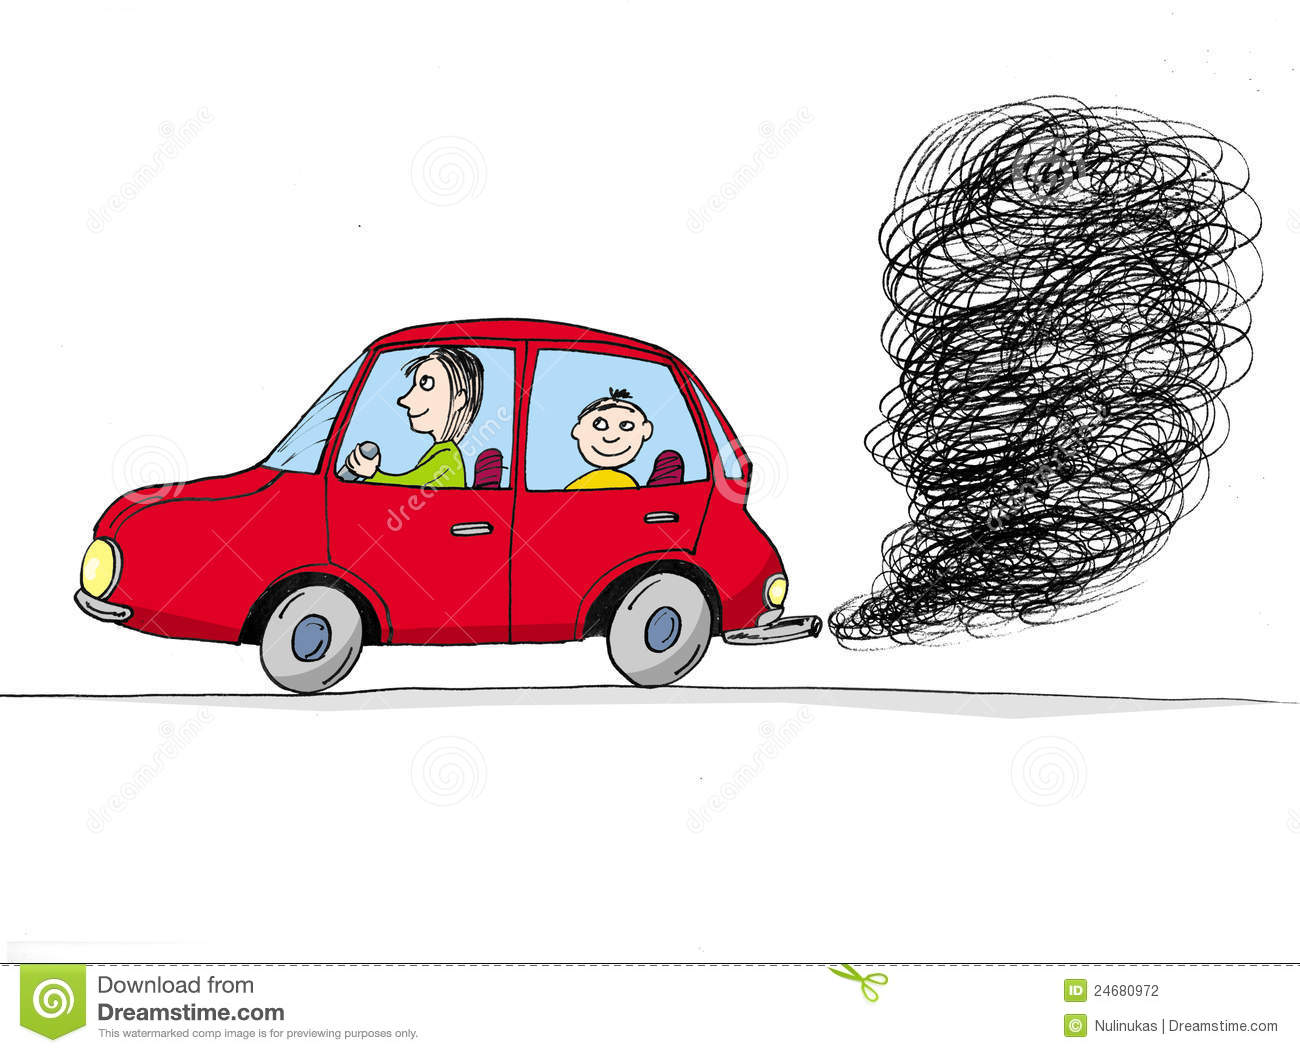 No Smoking clipart car Car Smoking cliparts Smoke Clipart